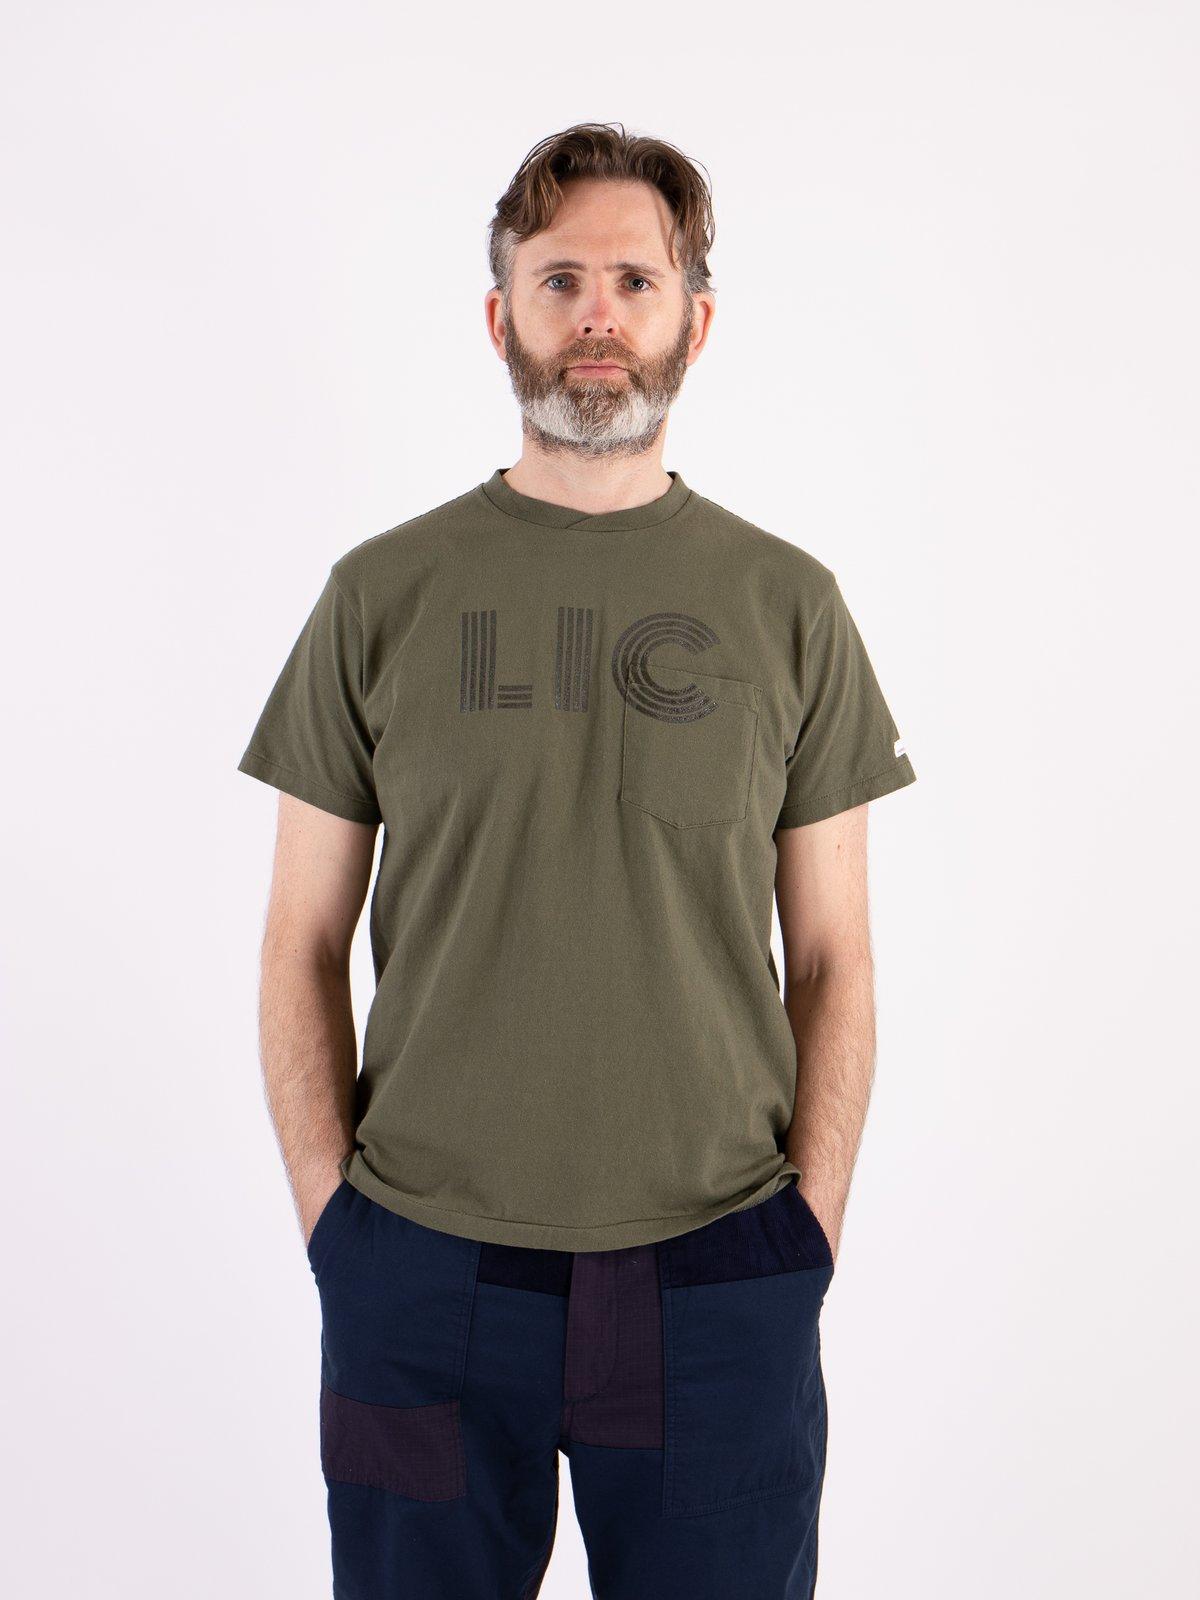 Olive LIC Printed T–Shirt - Image 2